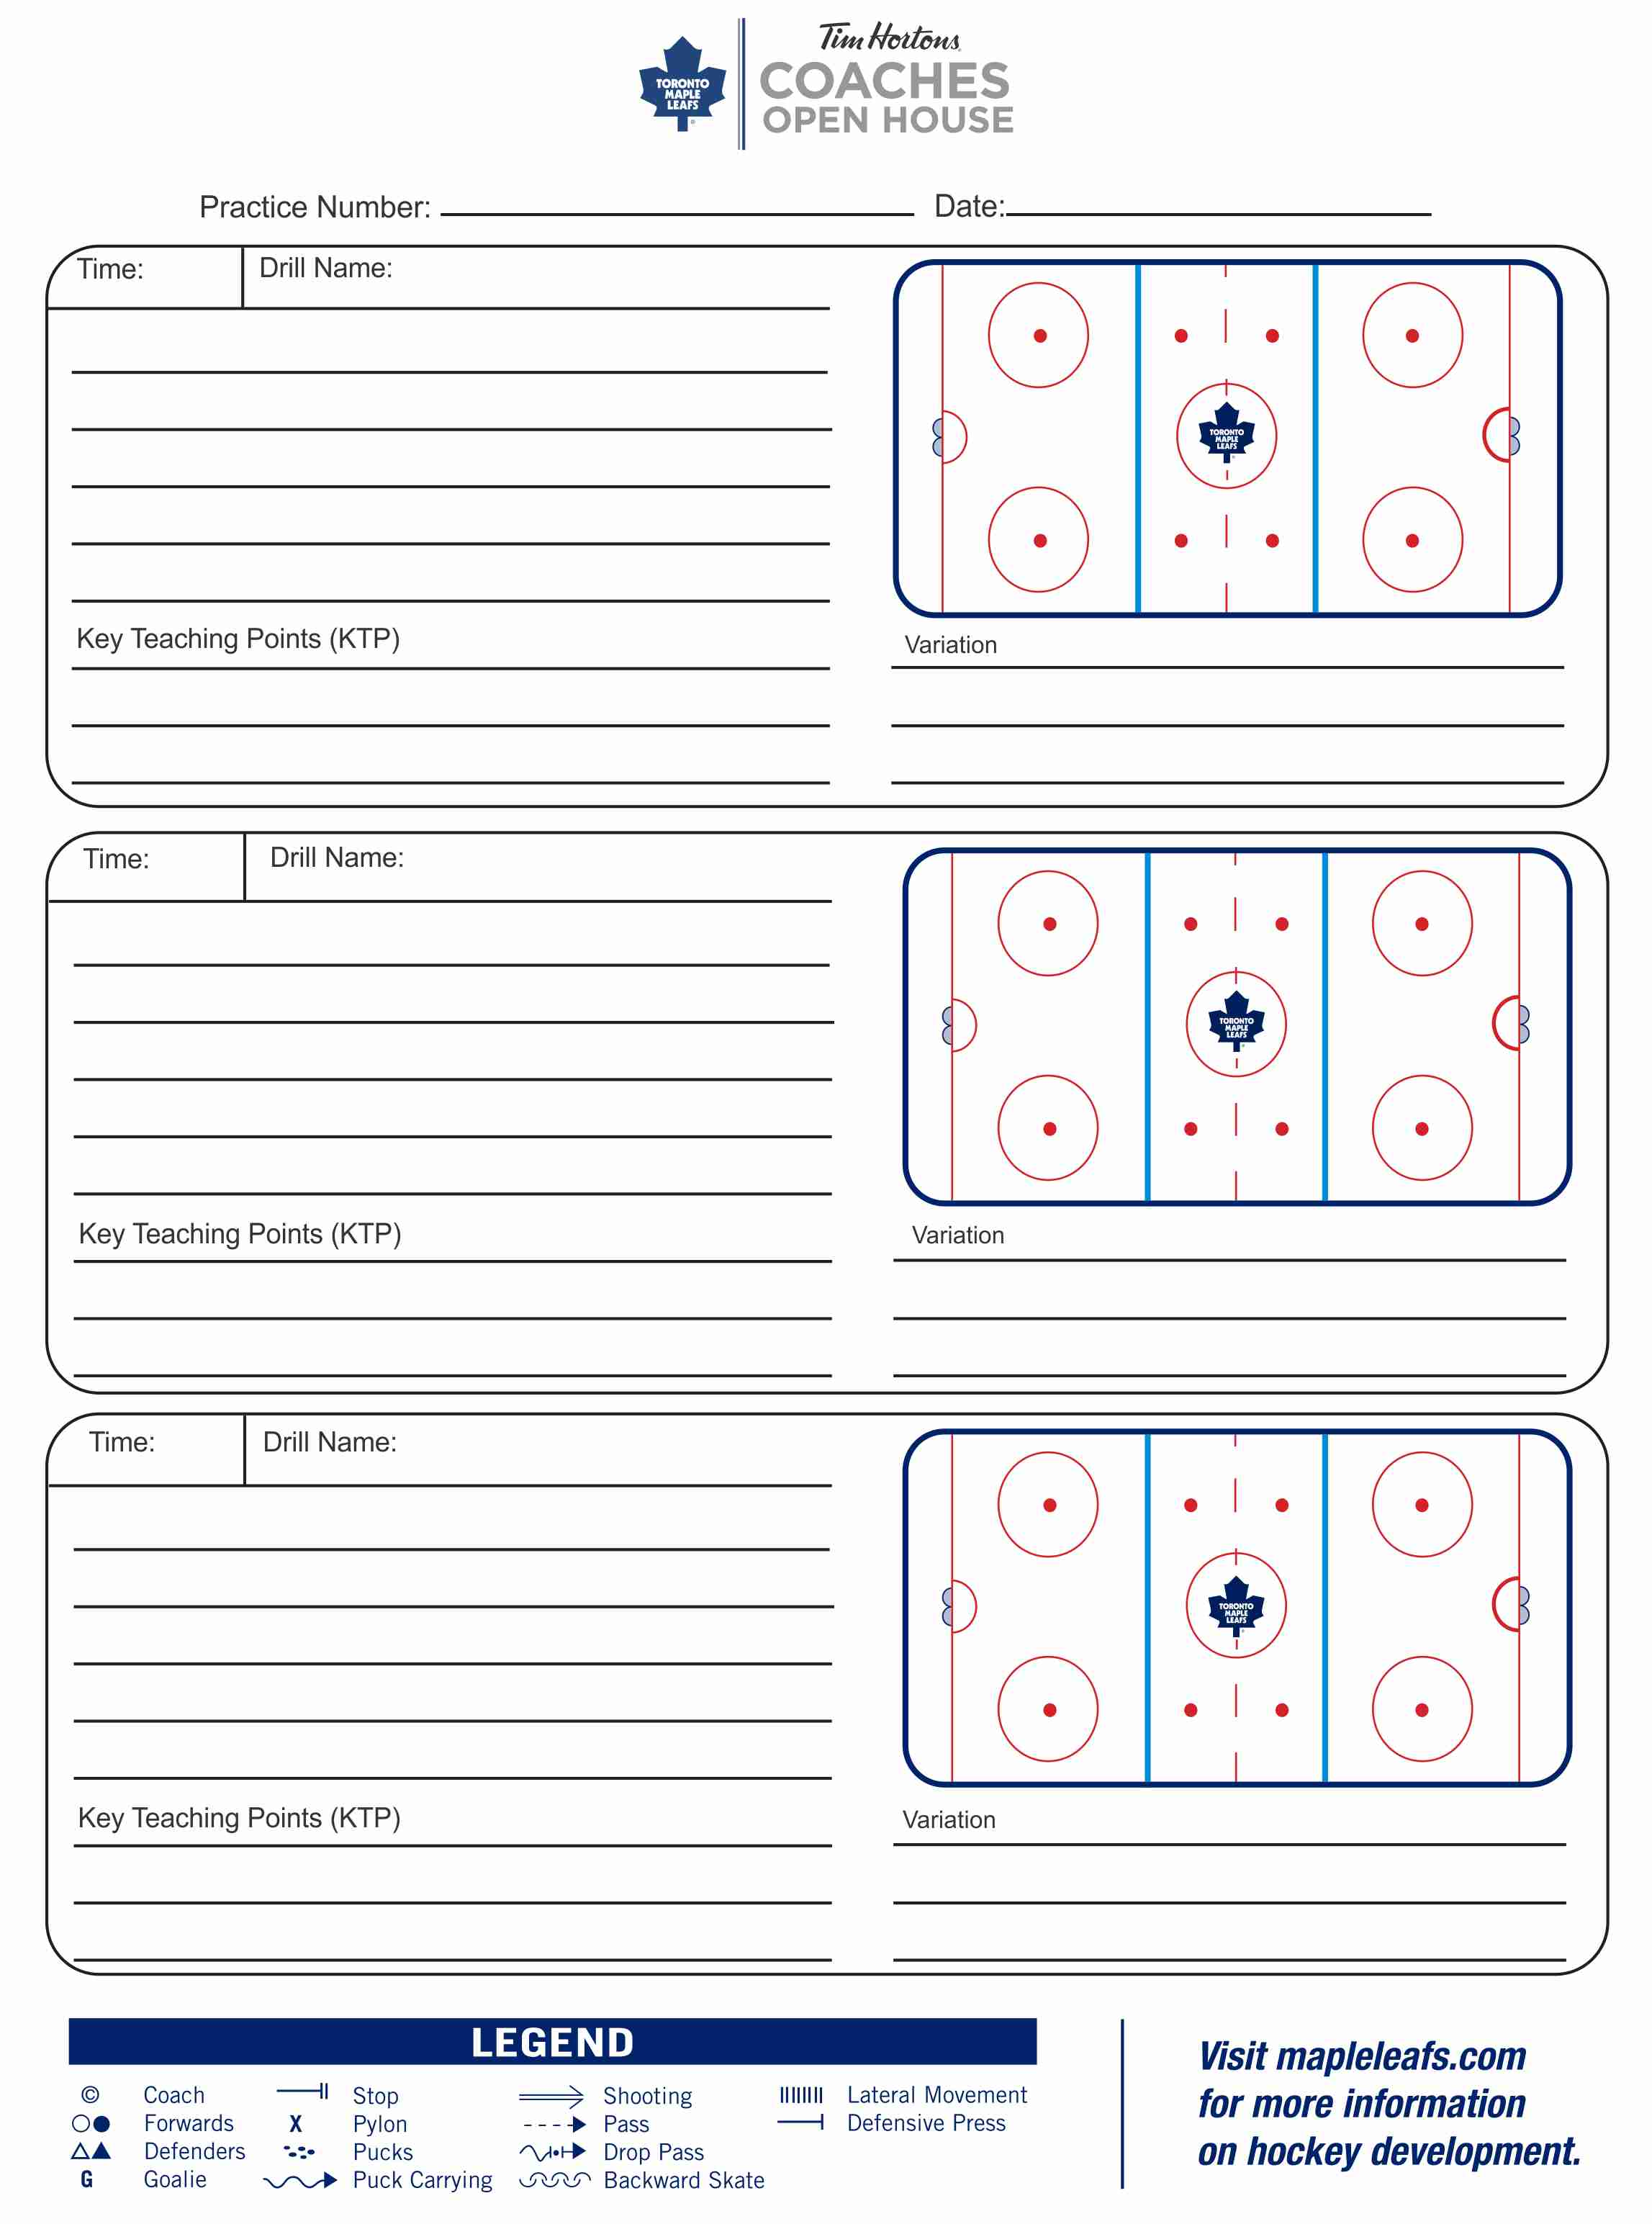 nhl hockey rink diagram printable wiring led light bar arena elsavadorla